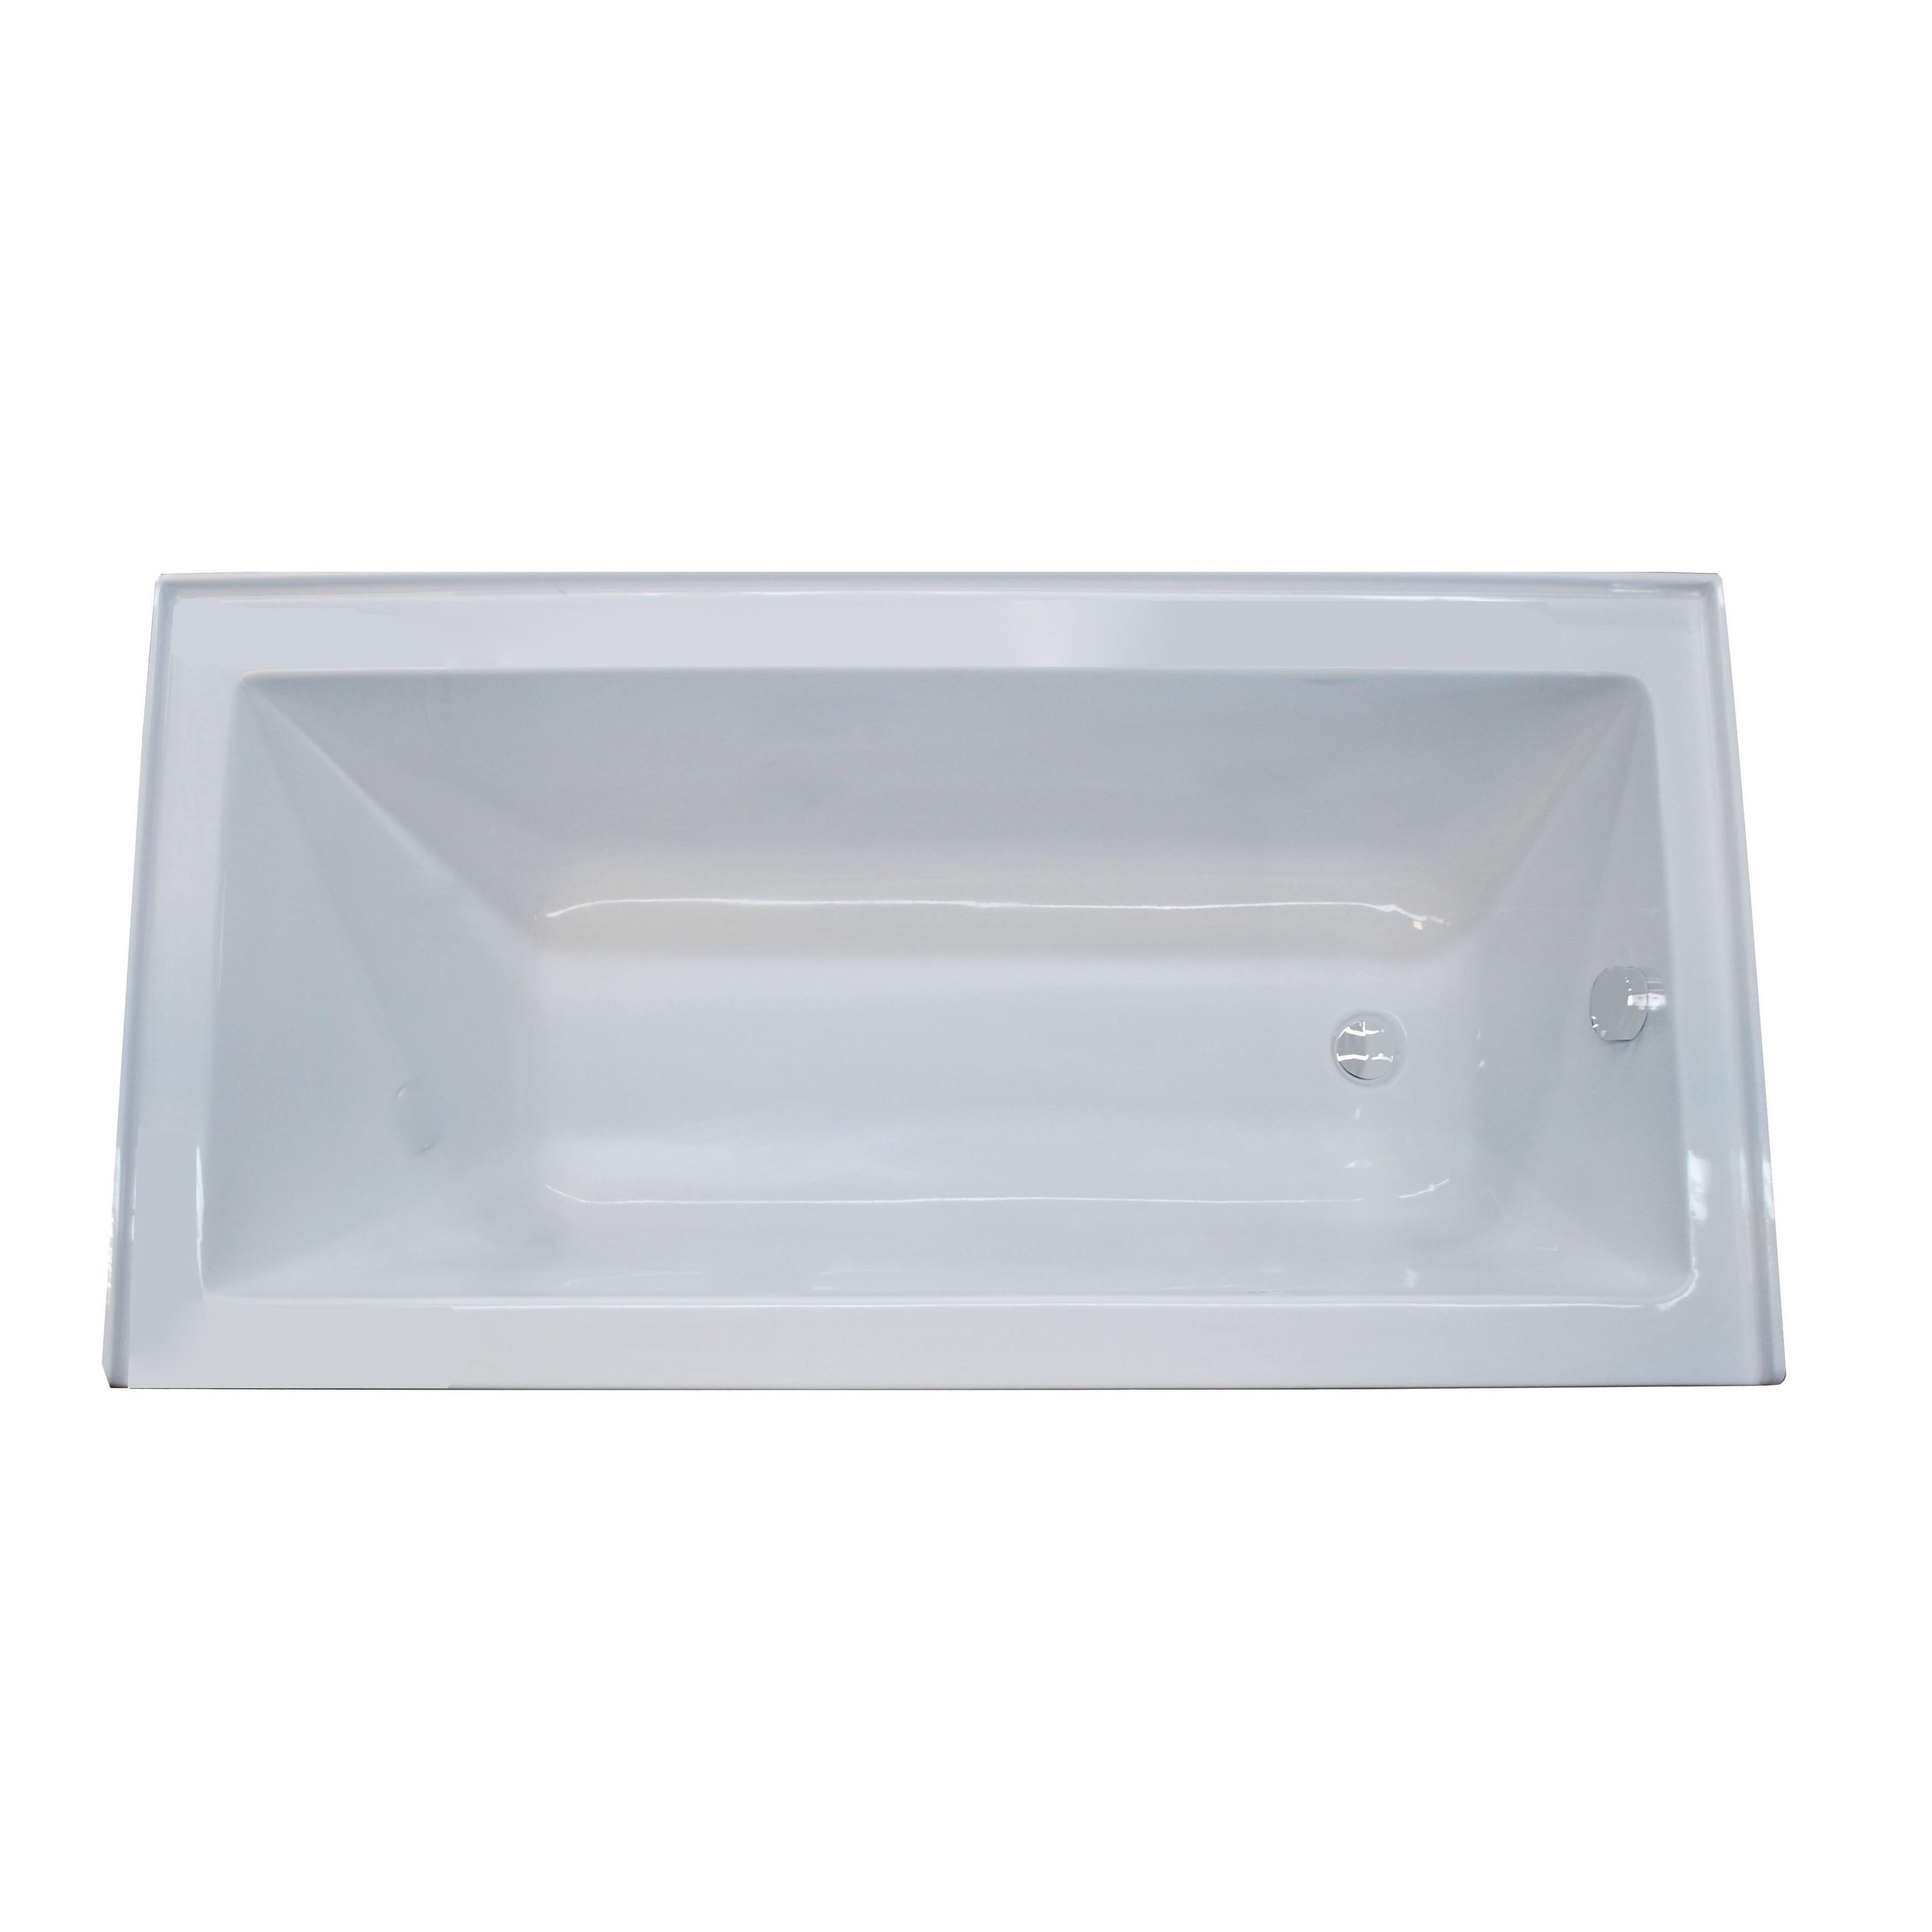 in drain left hand door x baths walk air bathroom and tub b bathtub value with series soaking spa gelcoat inch